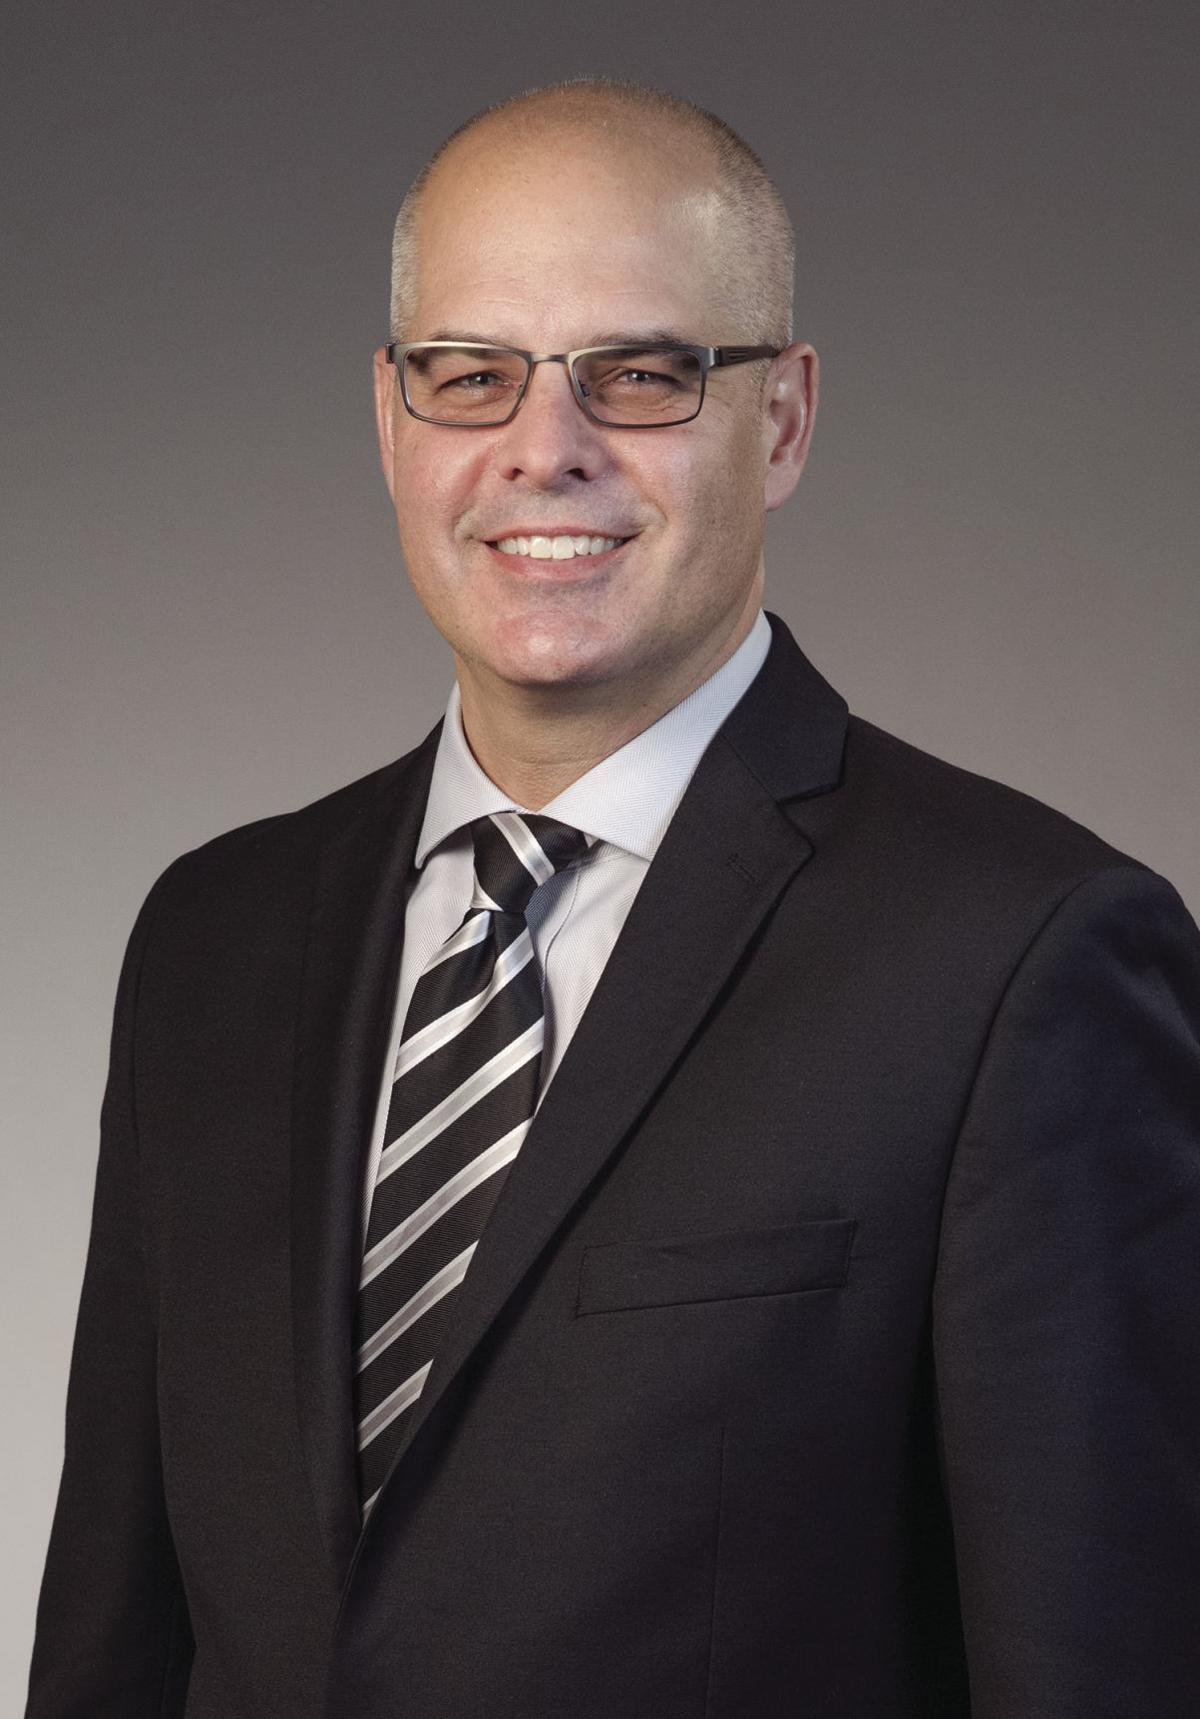 Dr. Mark Thompson